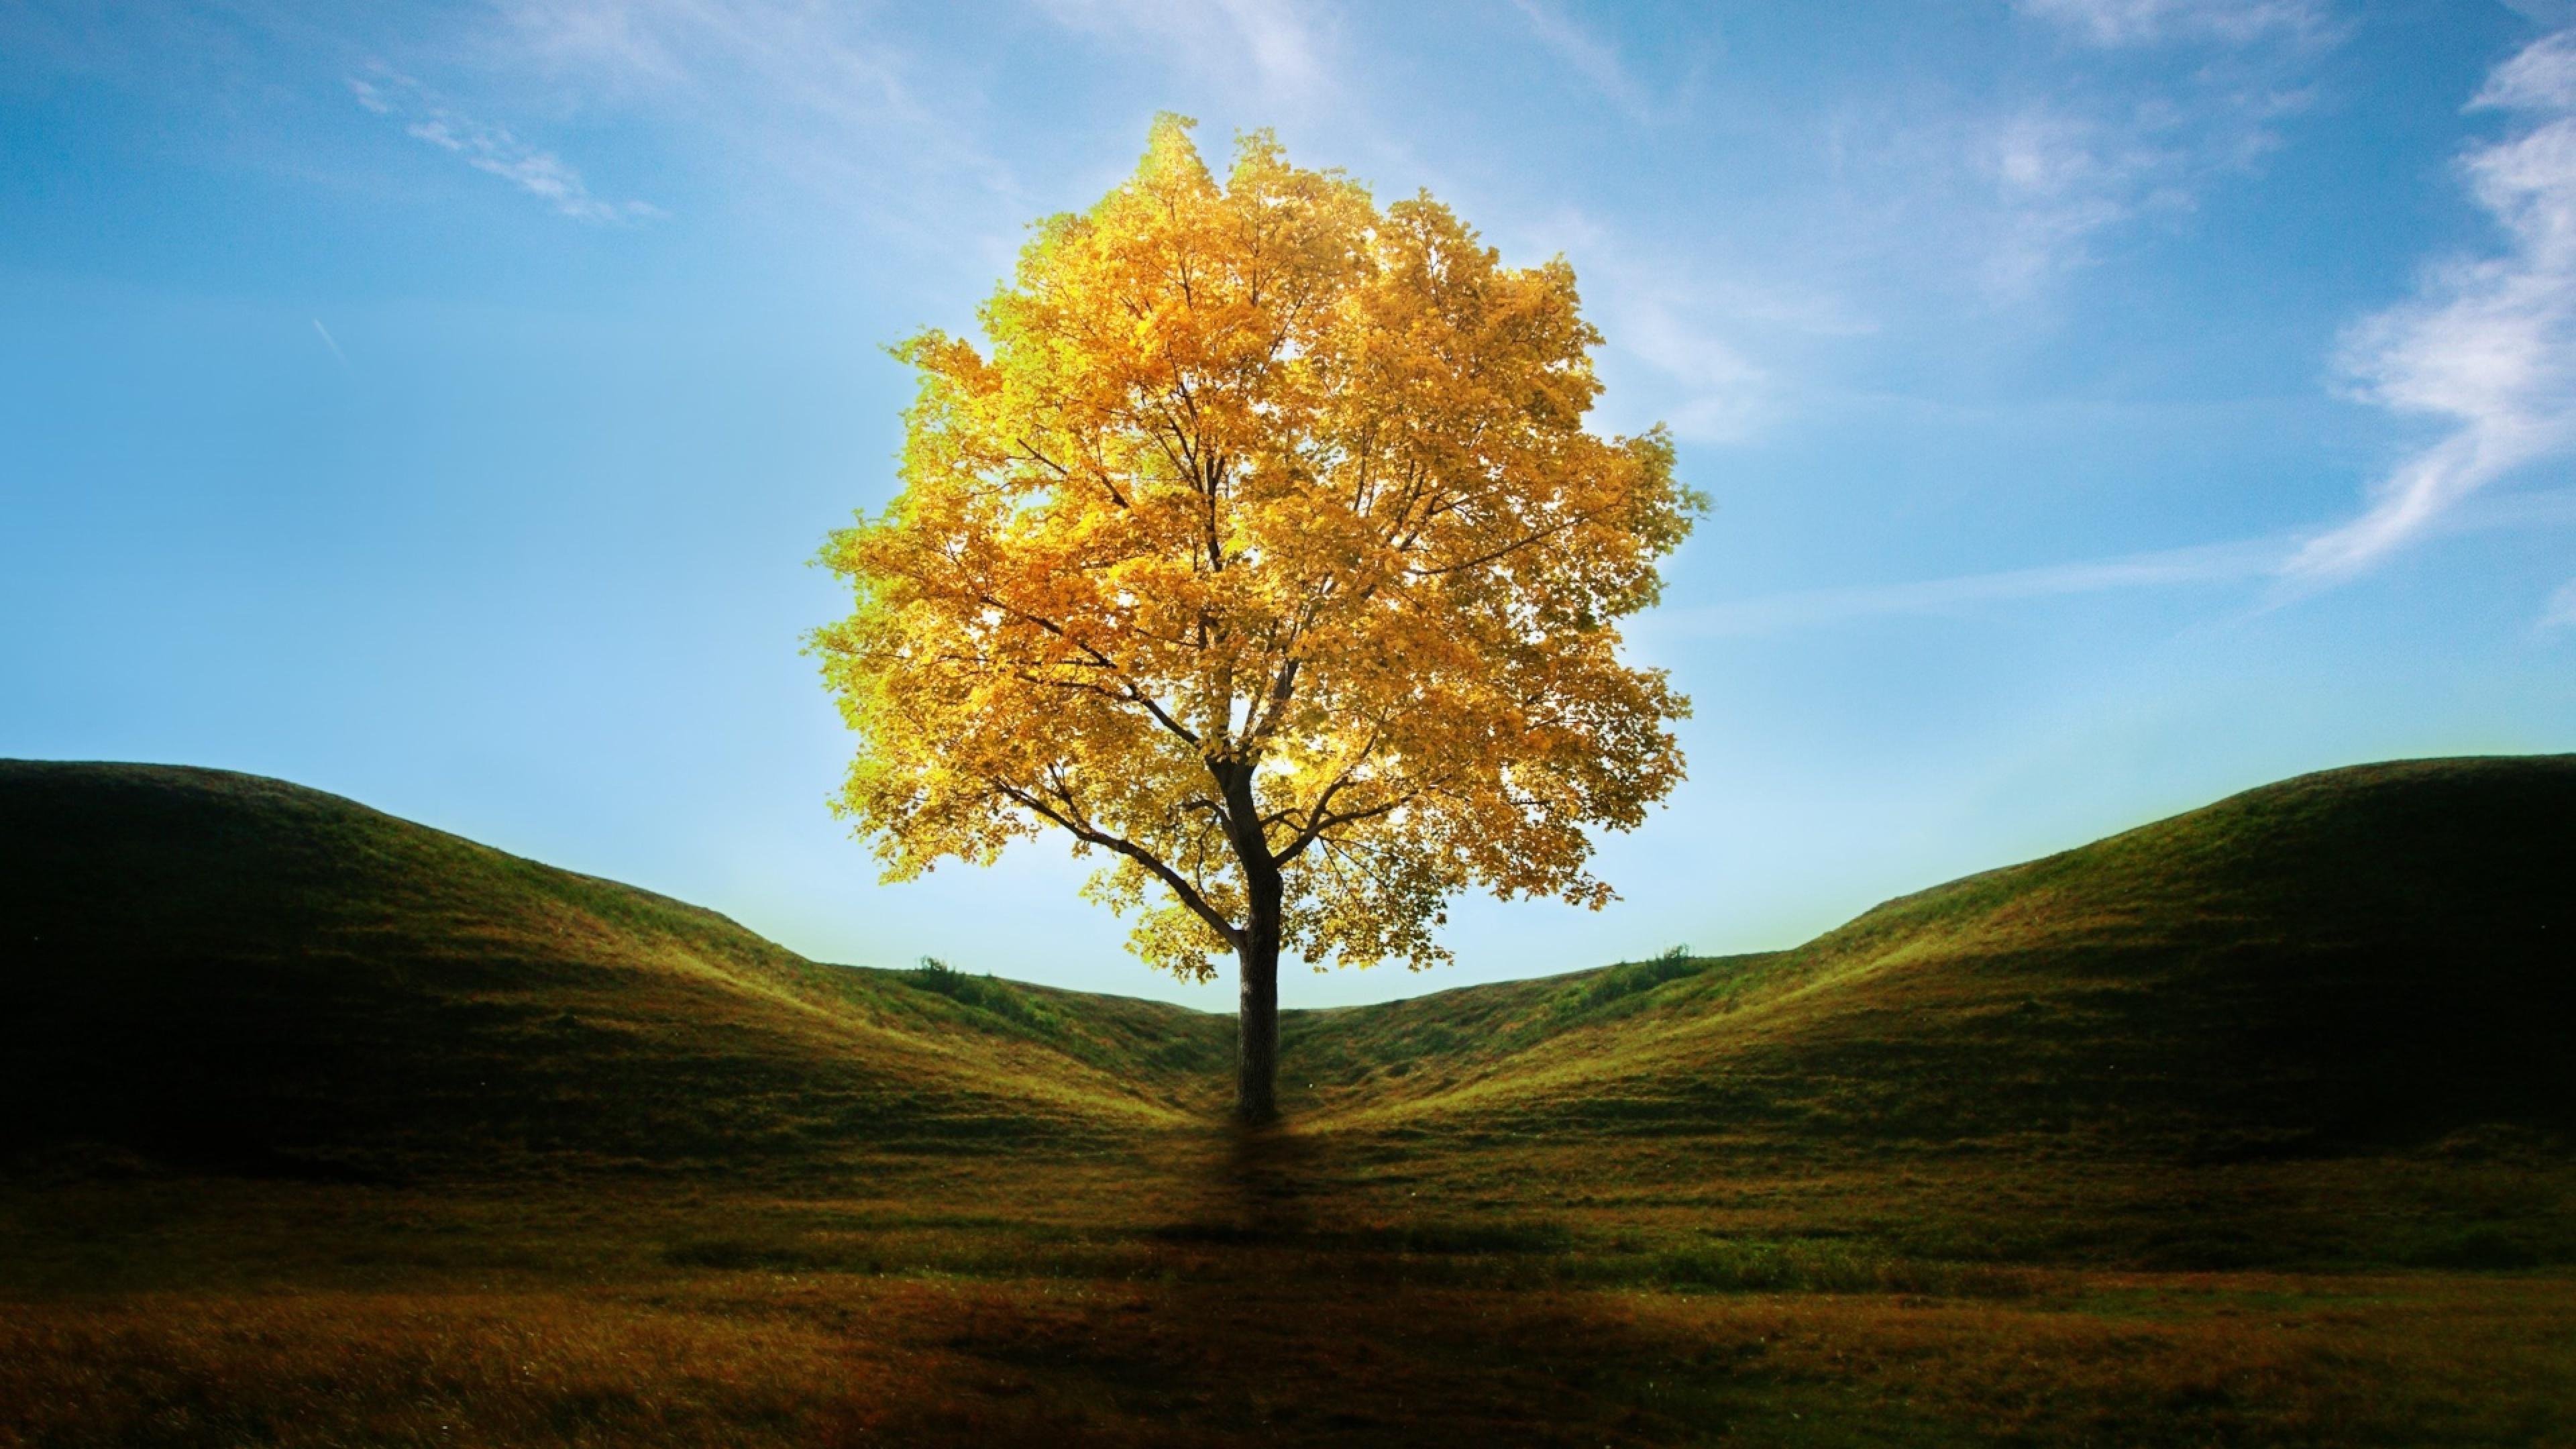 Fall free image